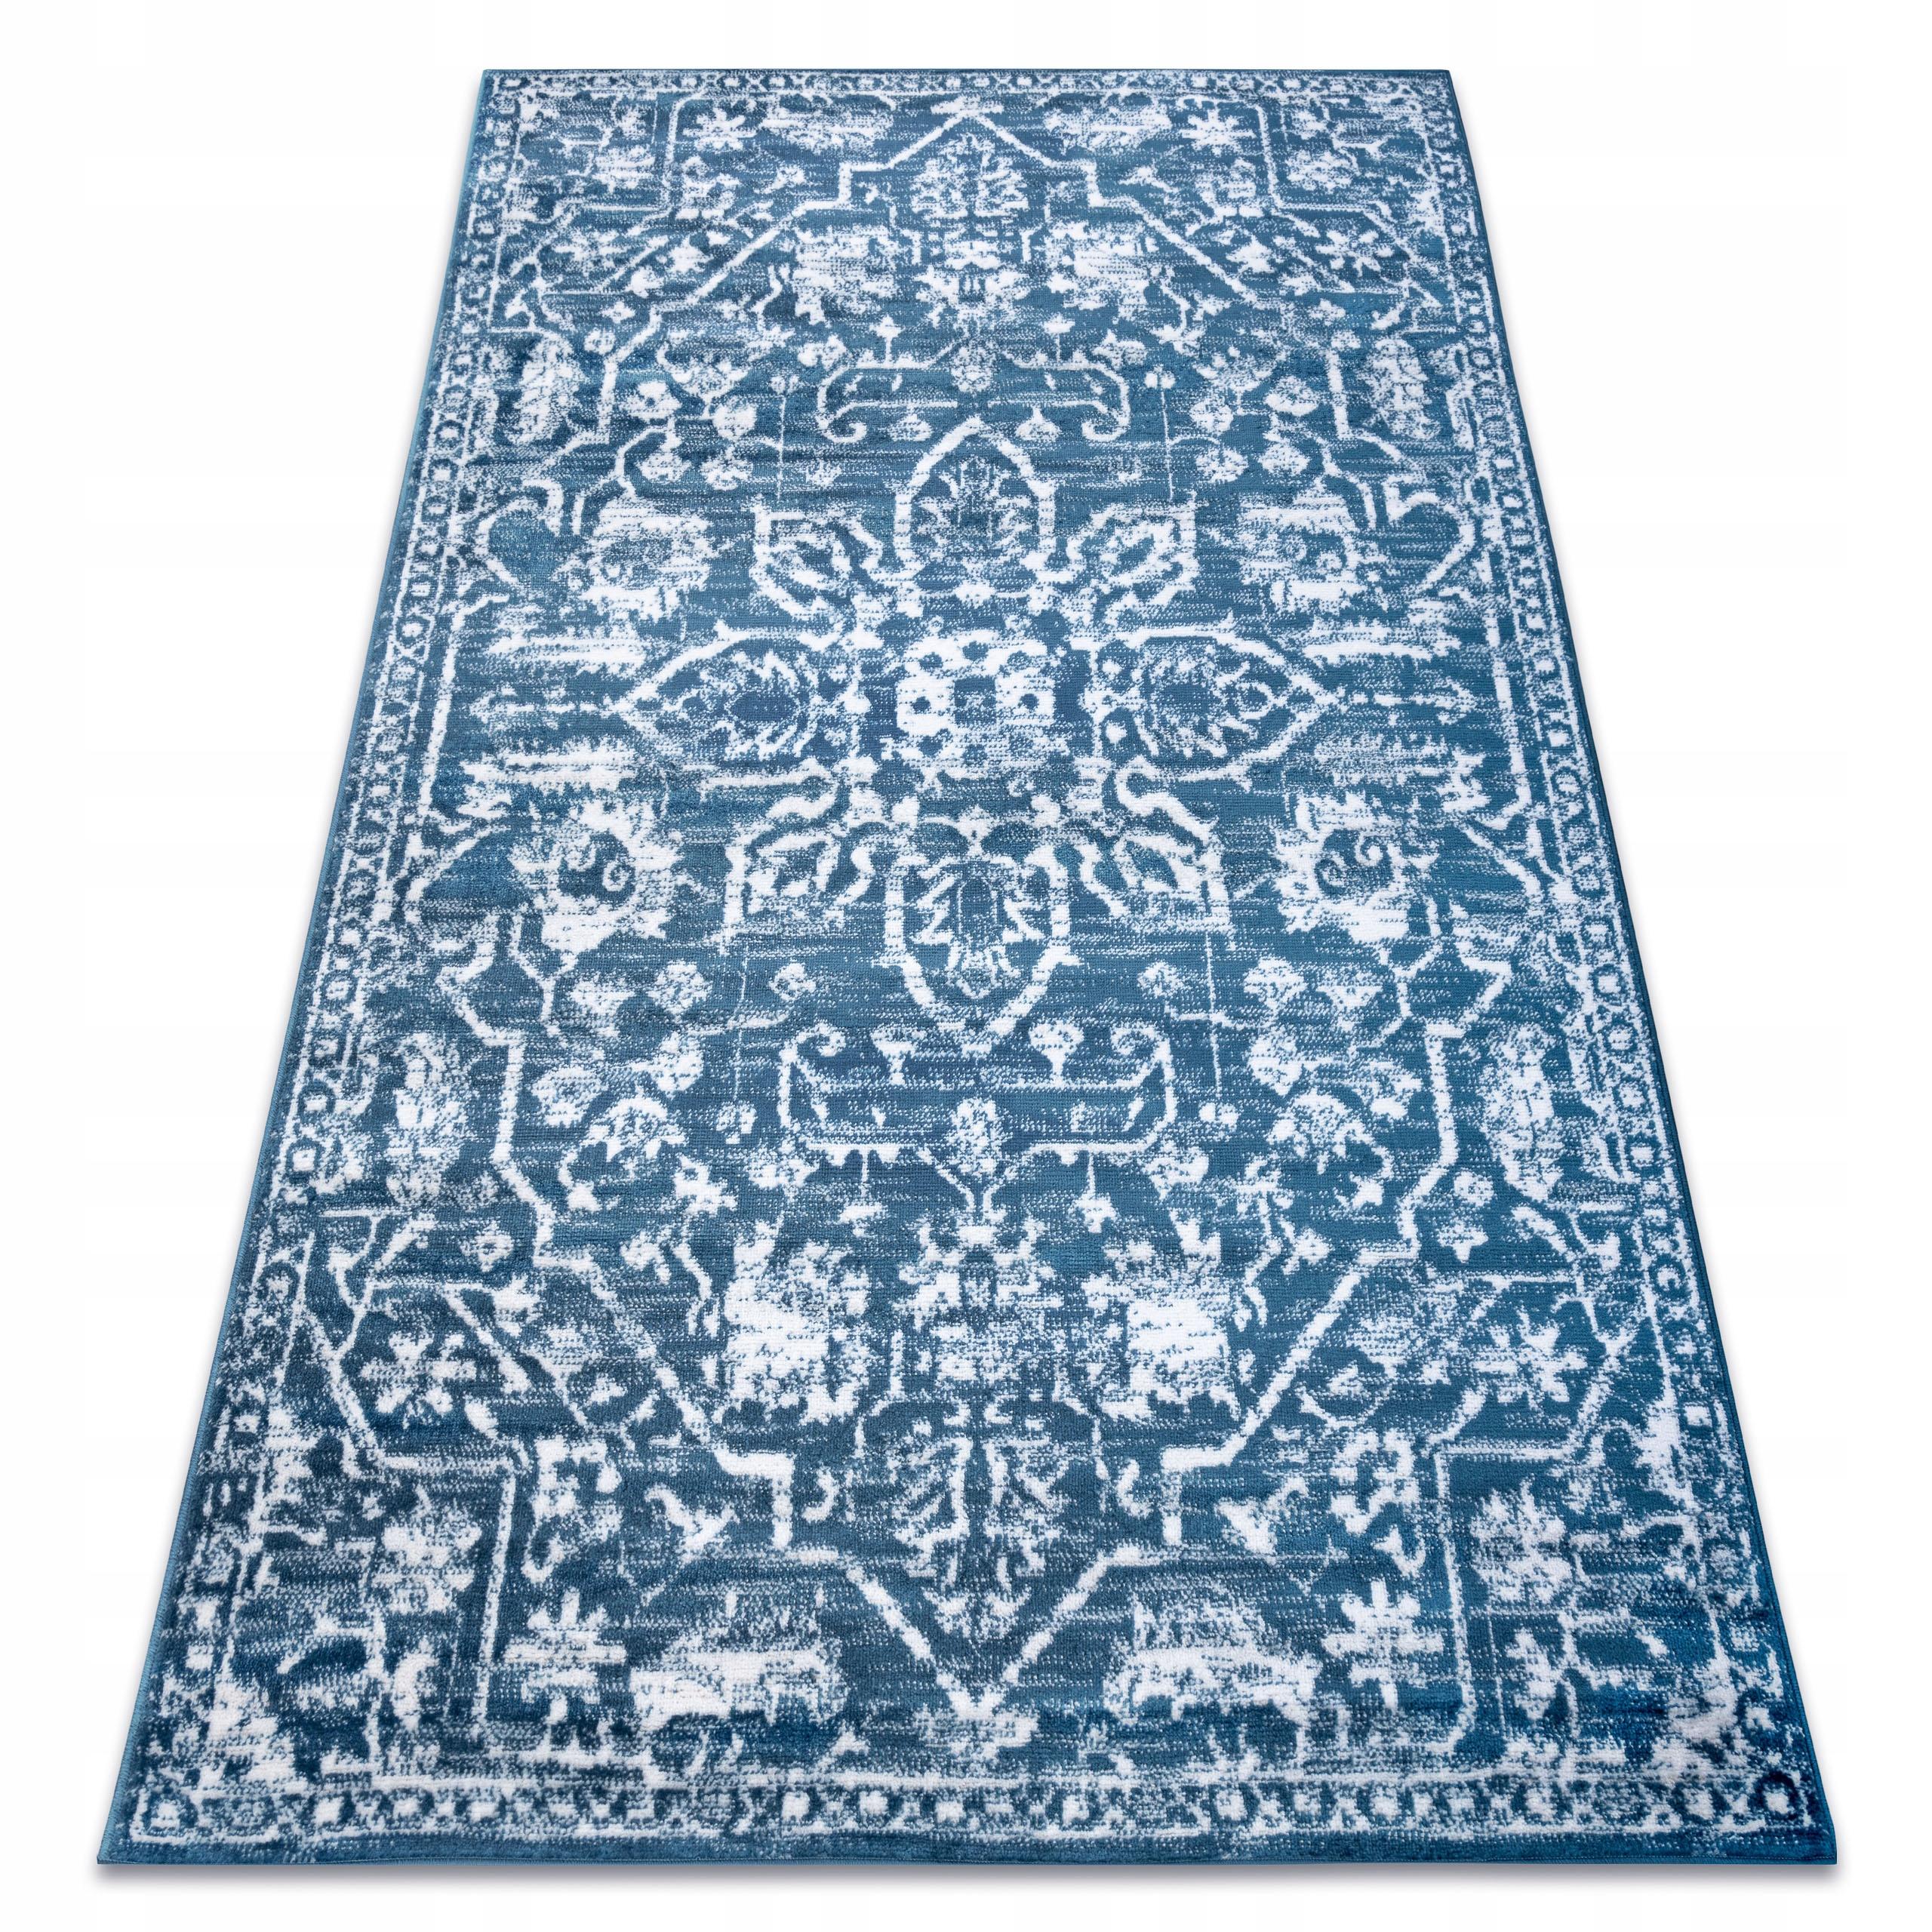 RETRO KOBEREC 160x220 cm VINTAGE blue #GR3393